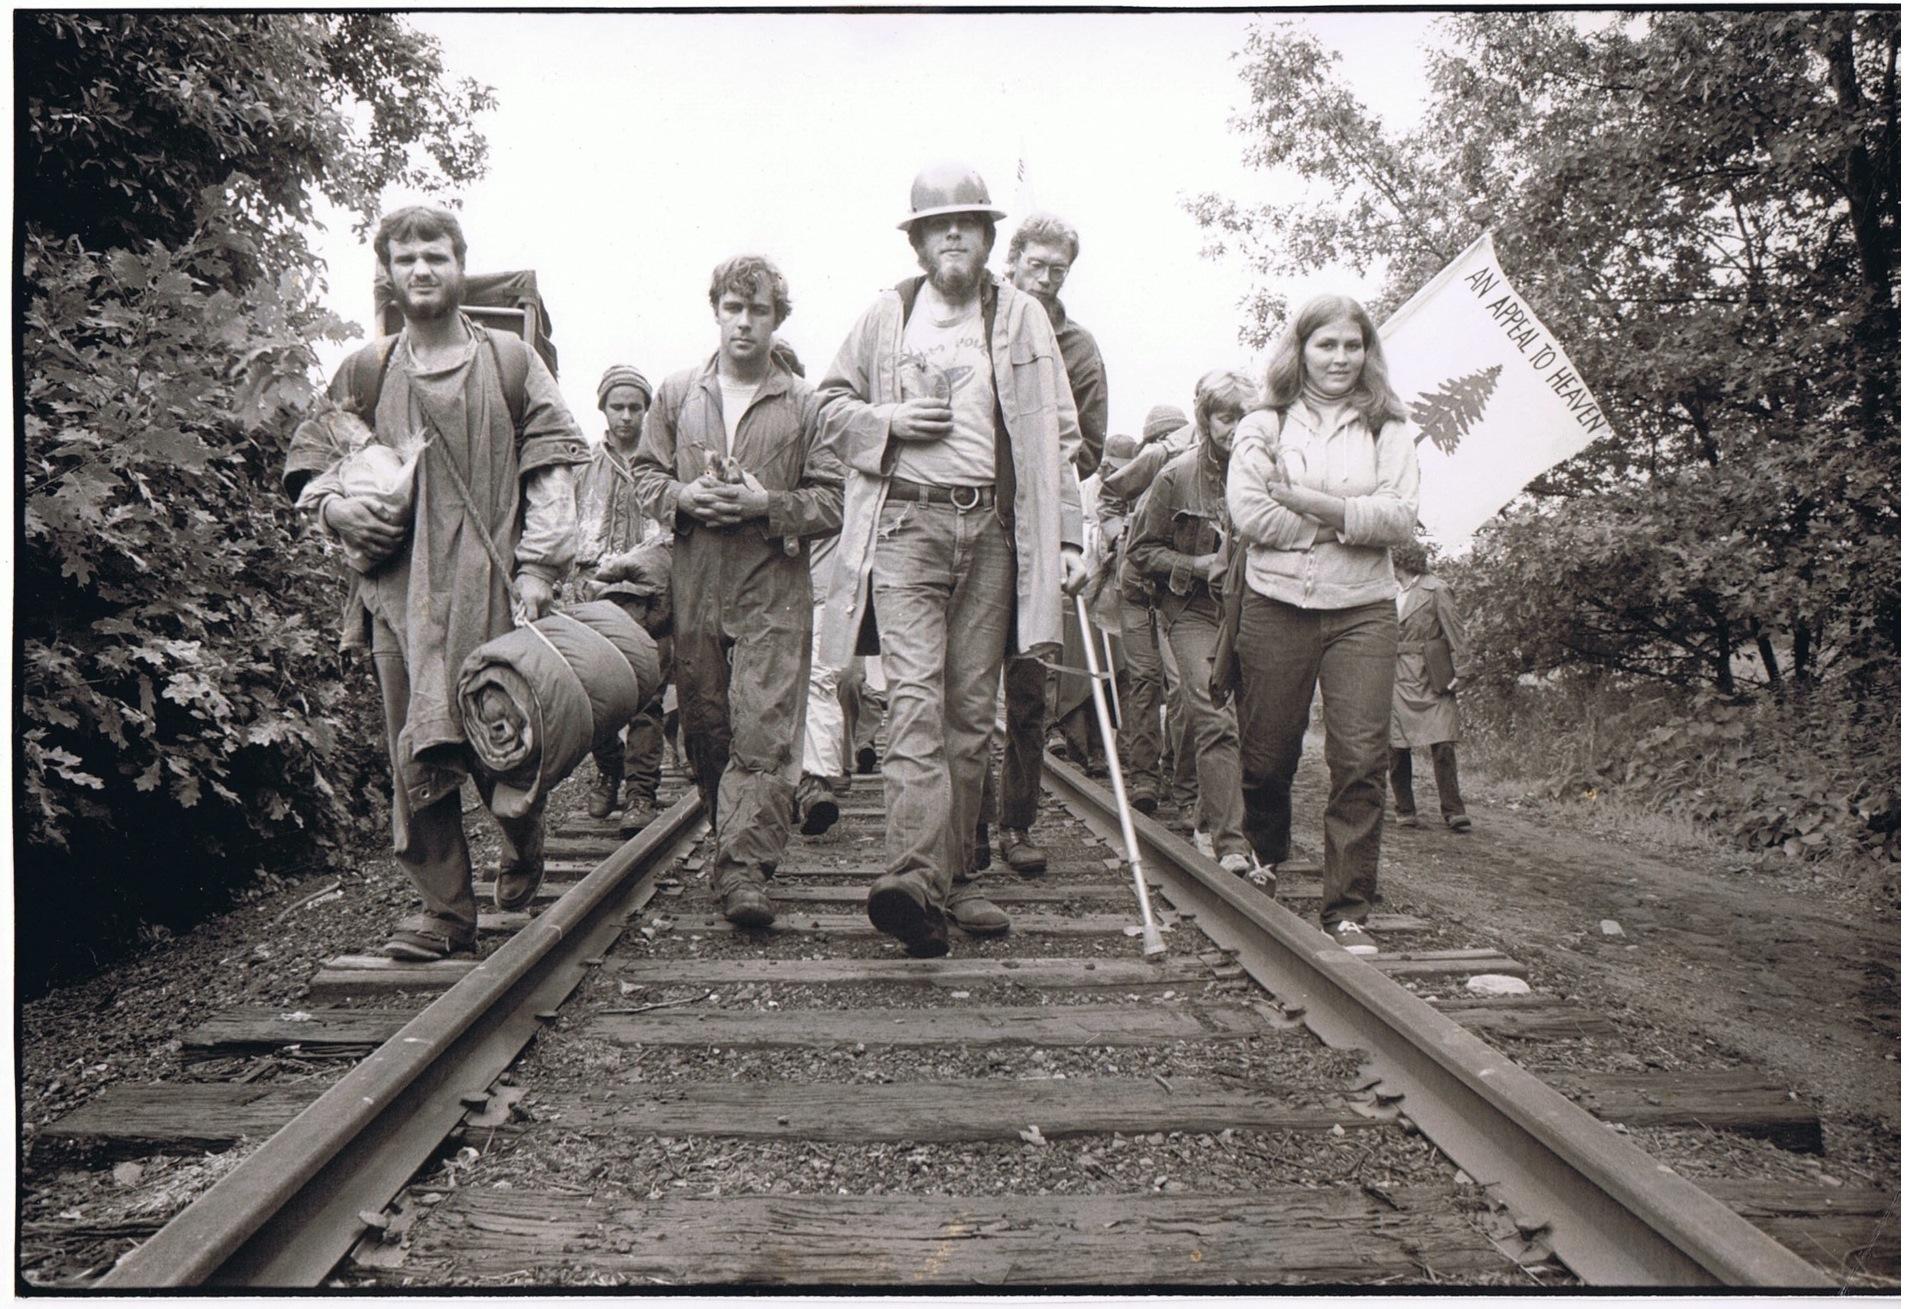 Clamshell Alliance members walk down railroad tracks